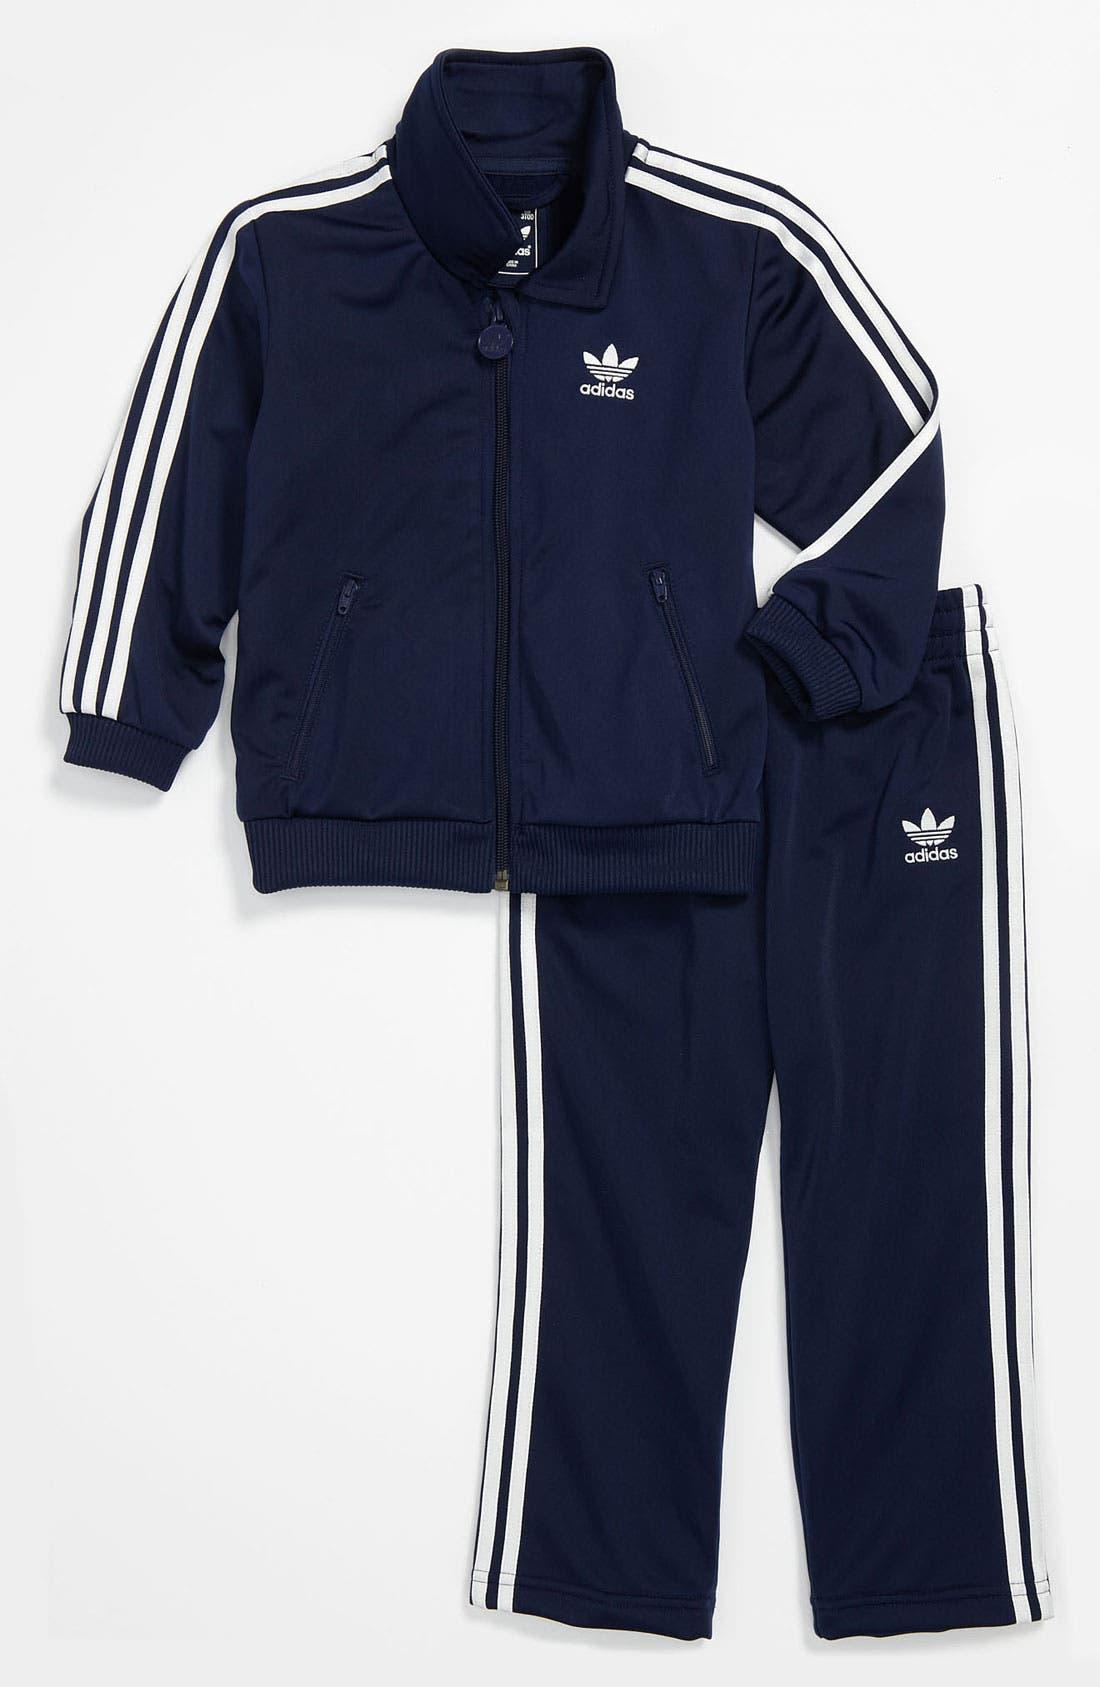 Main Image - adidas 'Firebird' Jacket & Pants (Infant)